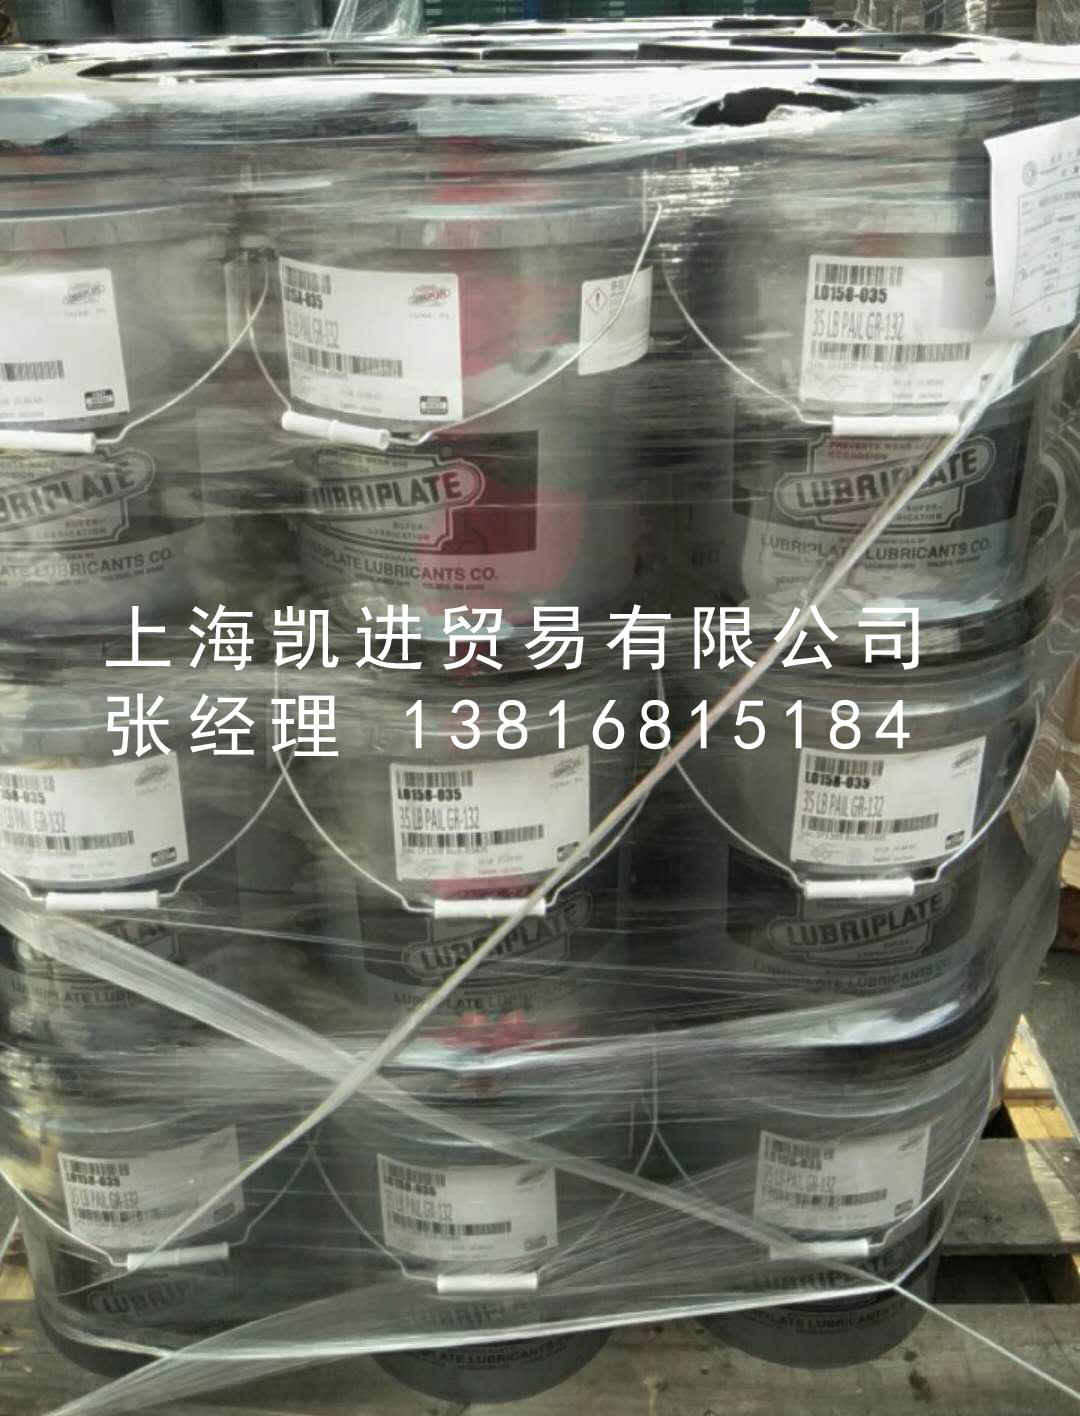 威氏Lubriplate No.930-AAA润滑脂